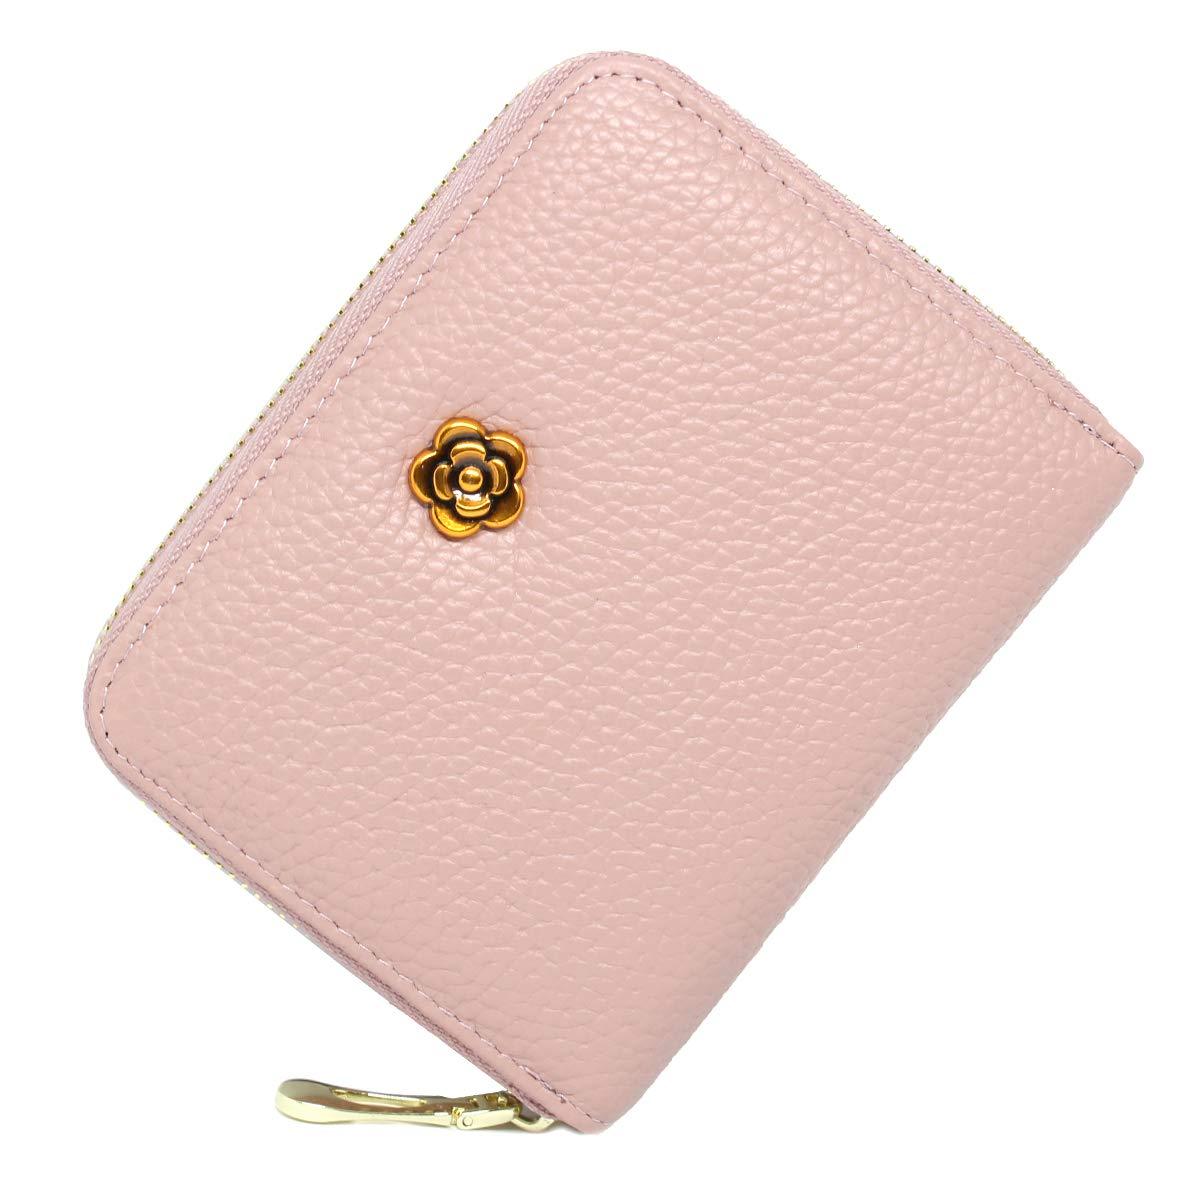 imeetu Women RFID Card Holder, Leather Wallet Card Case Organizer,M(Pink)